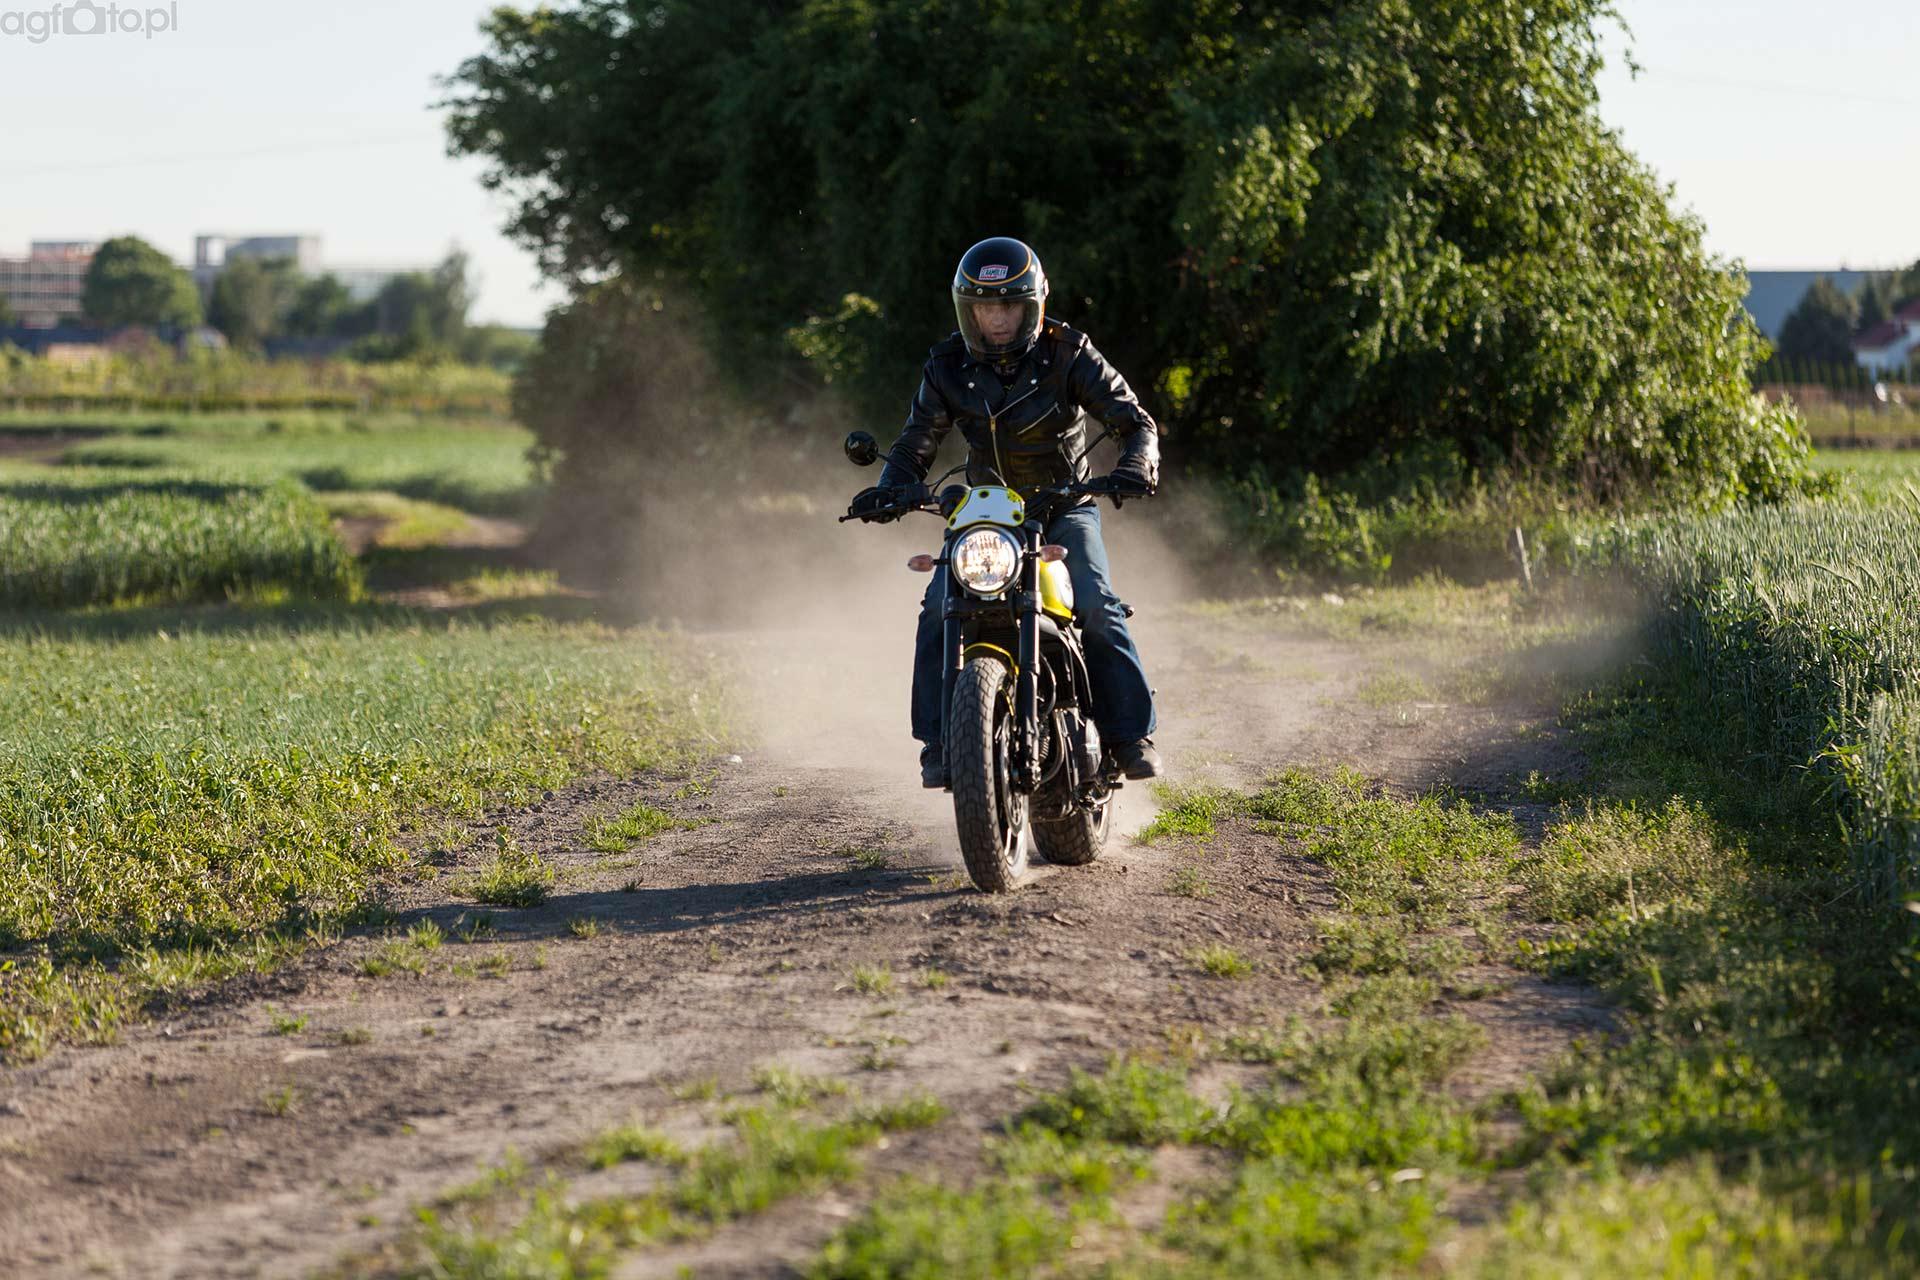 ducati_scrambler_enduro_motocyklicznie